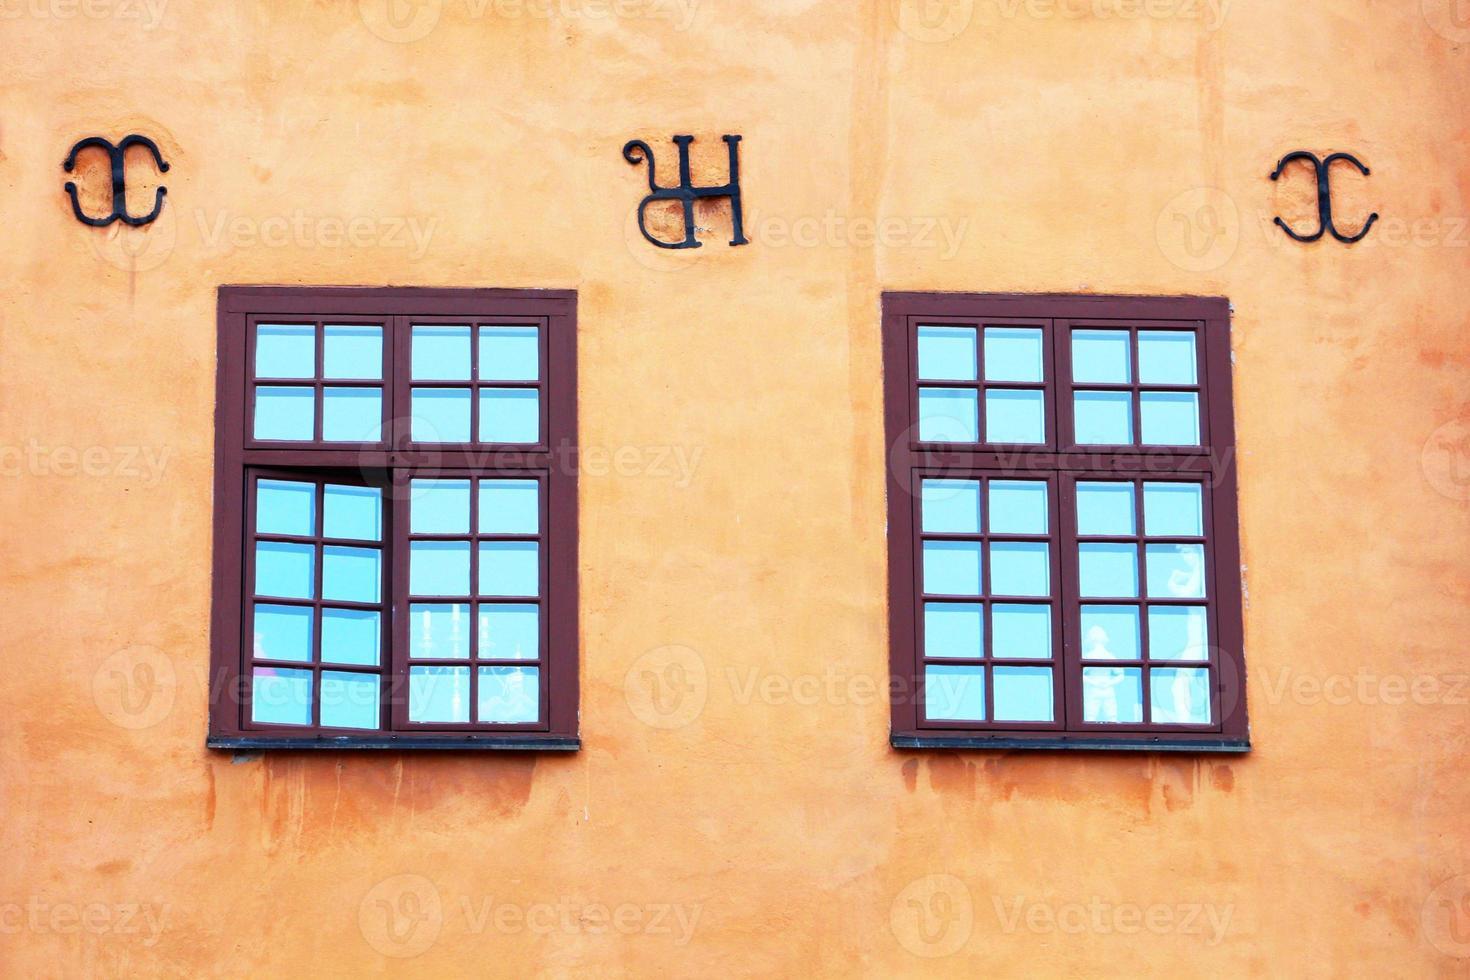 ramen van gele iconische gebouwen op stortorget in Stockholm, Zweden foto